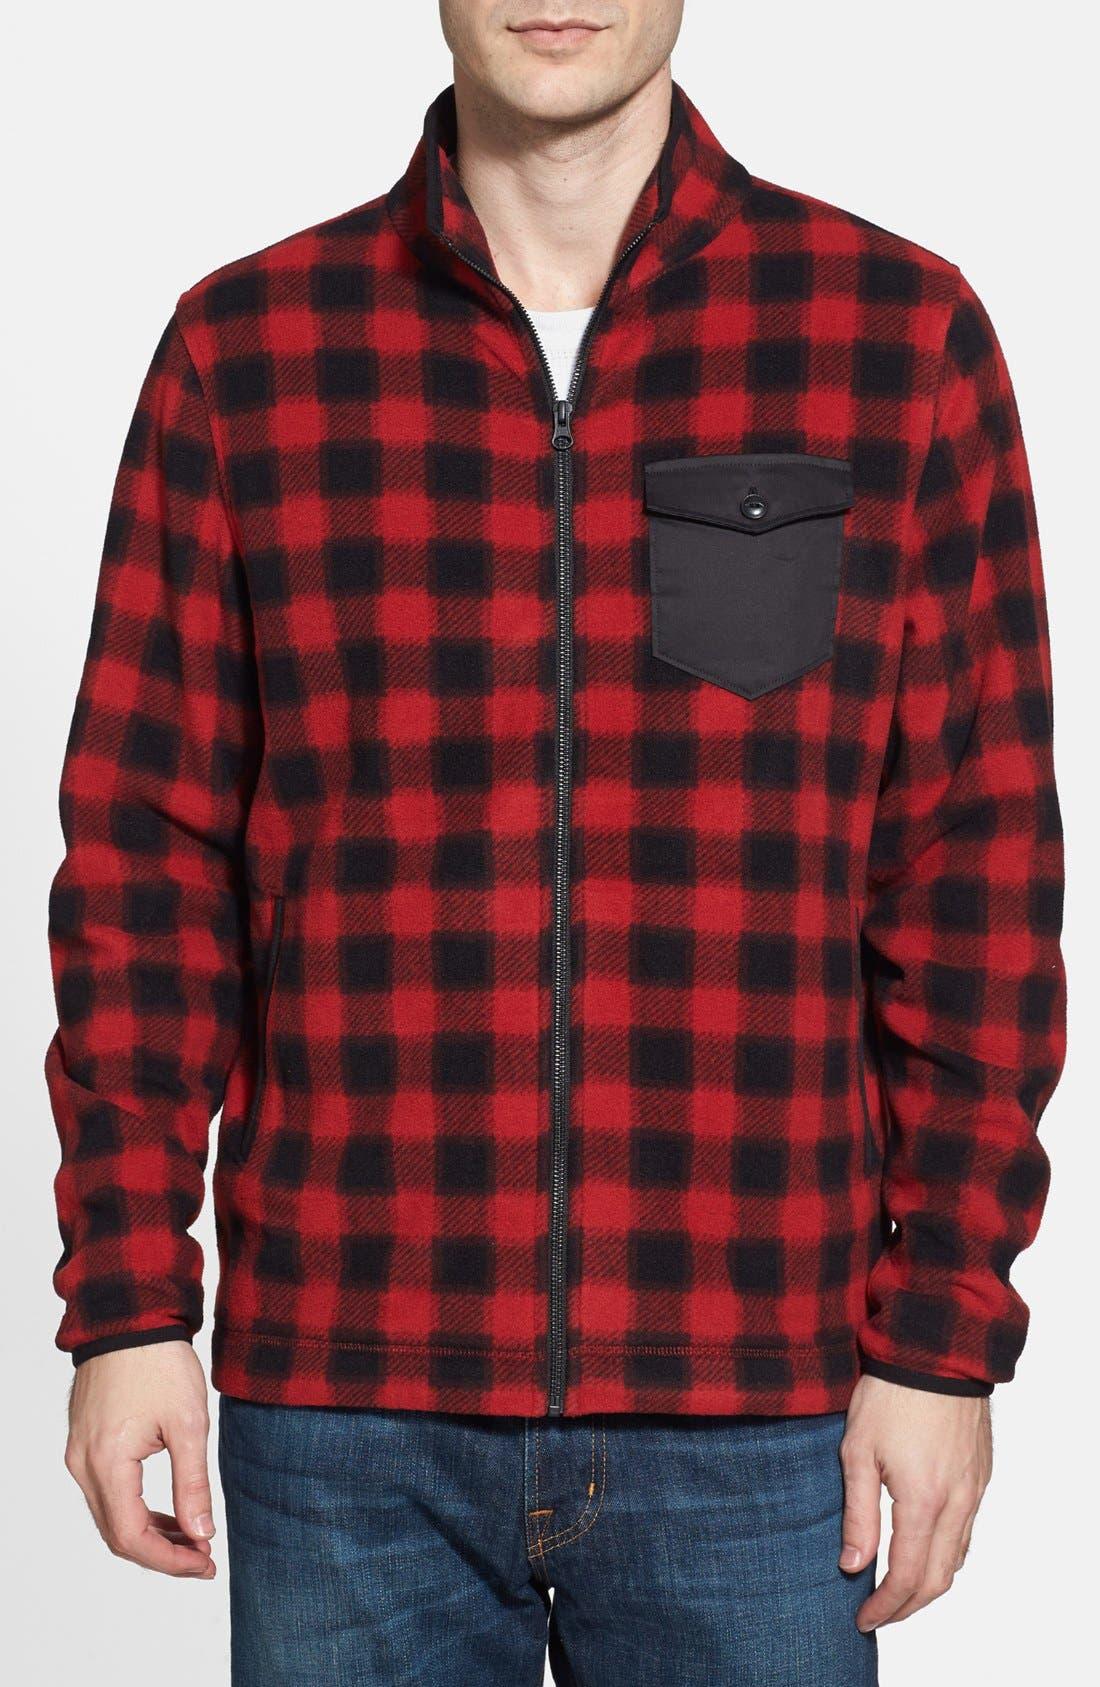 Main Image - Wallin & Bros. Trim Fit Plaid Full Zip Fleece